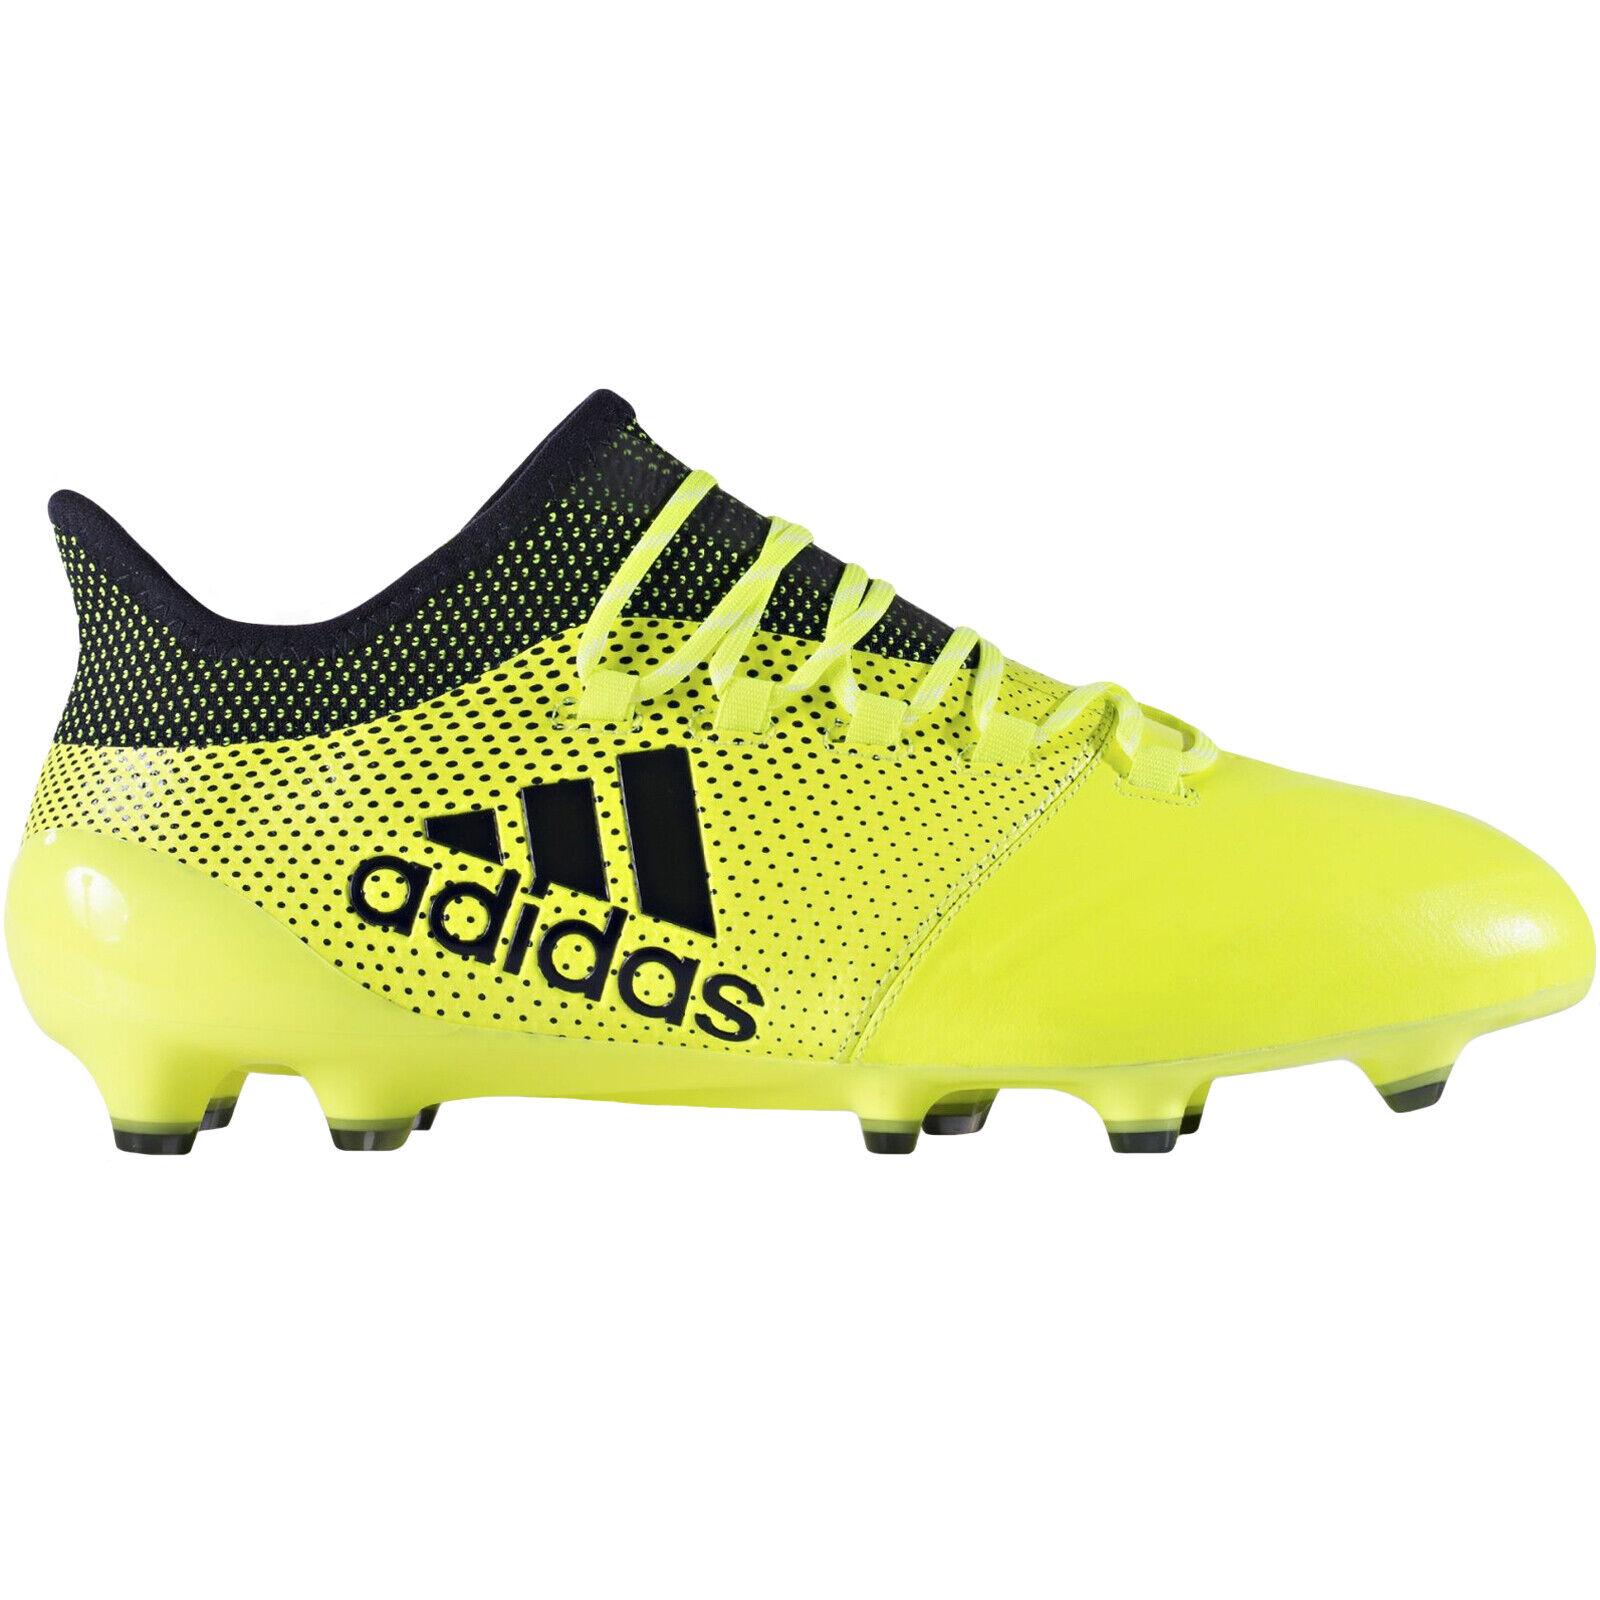 Adidas Performance Mens X 17.1 Leather Firm Ground Sports Football botas -amarillo